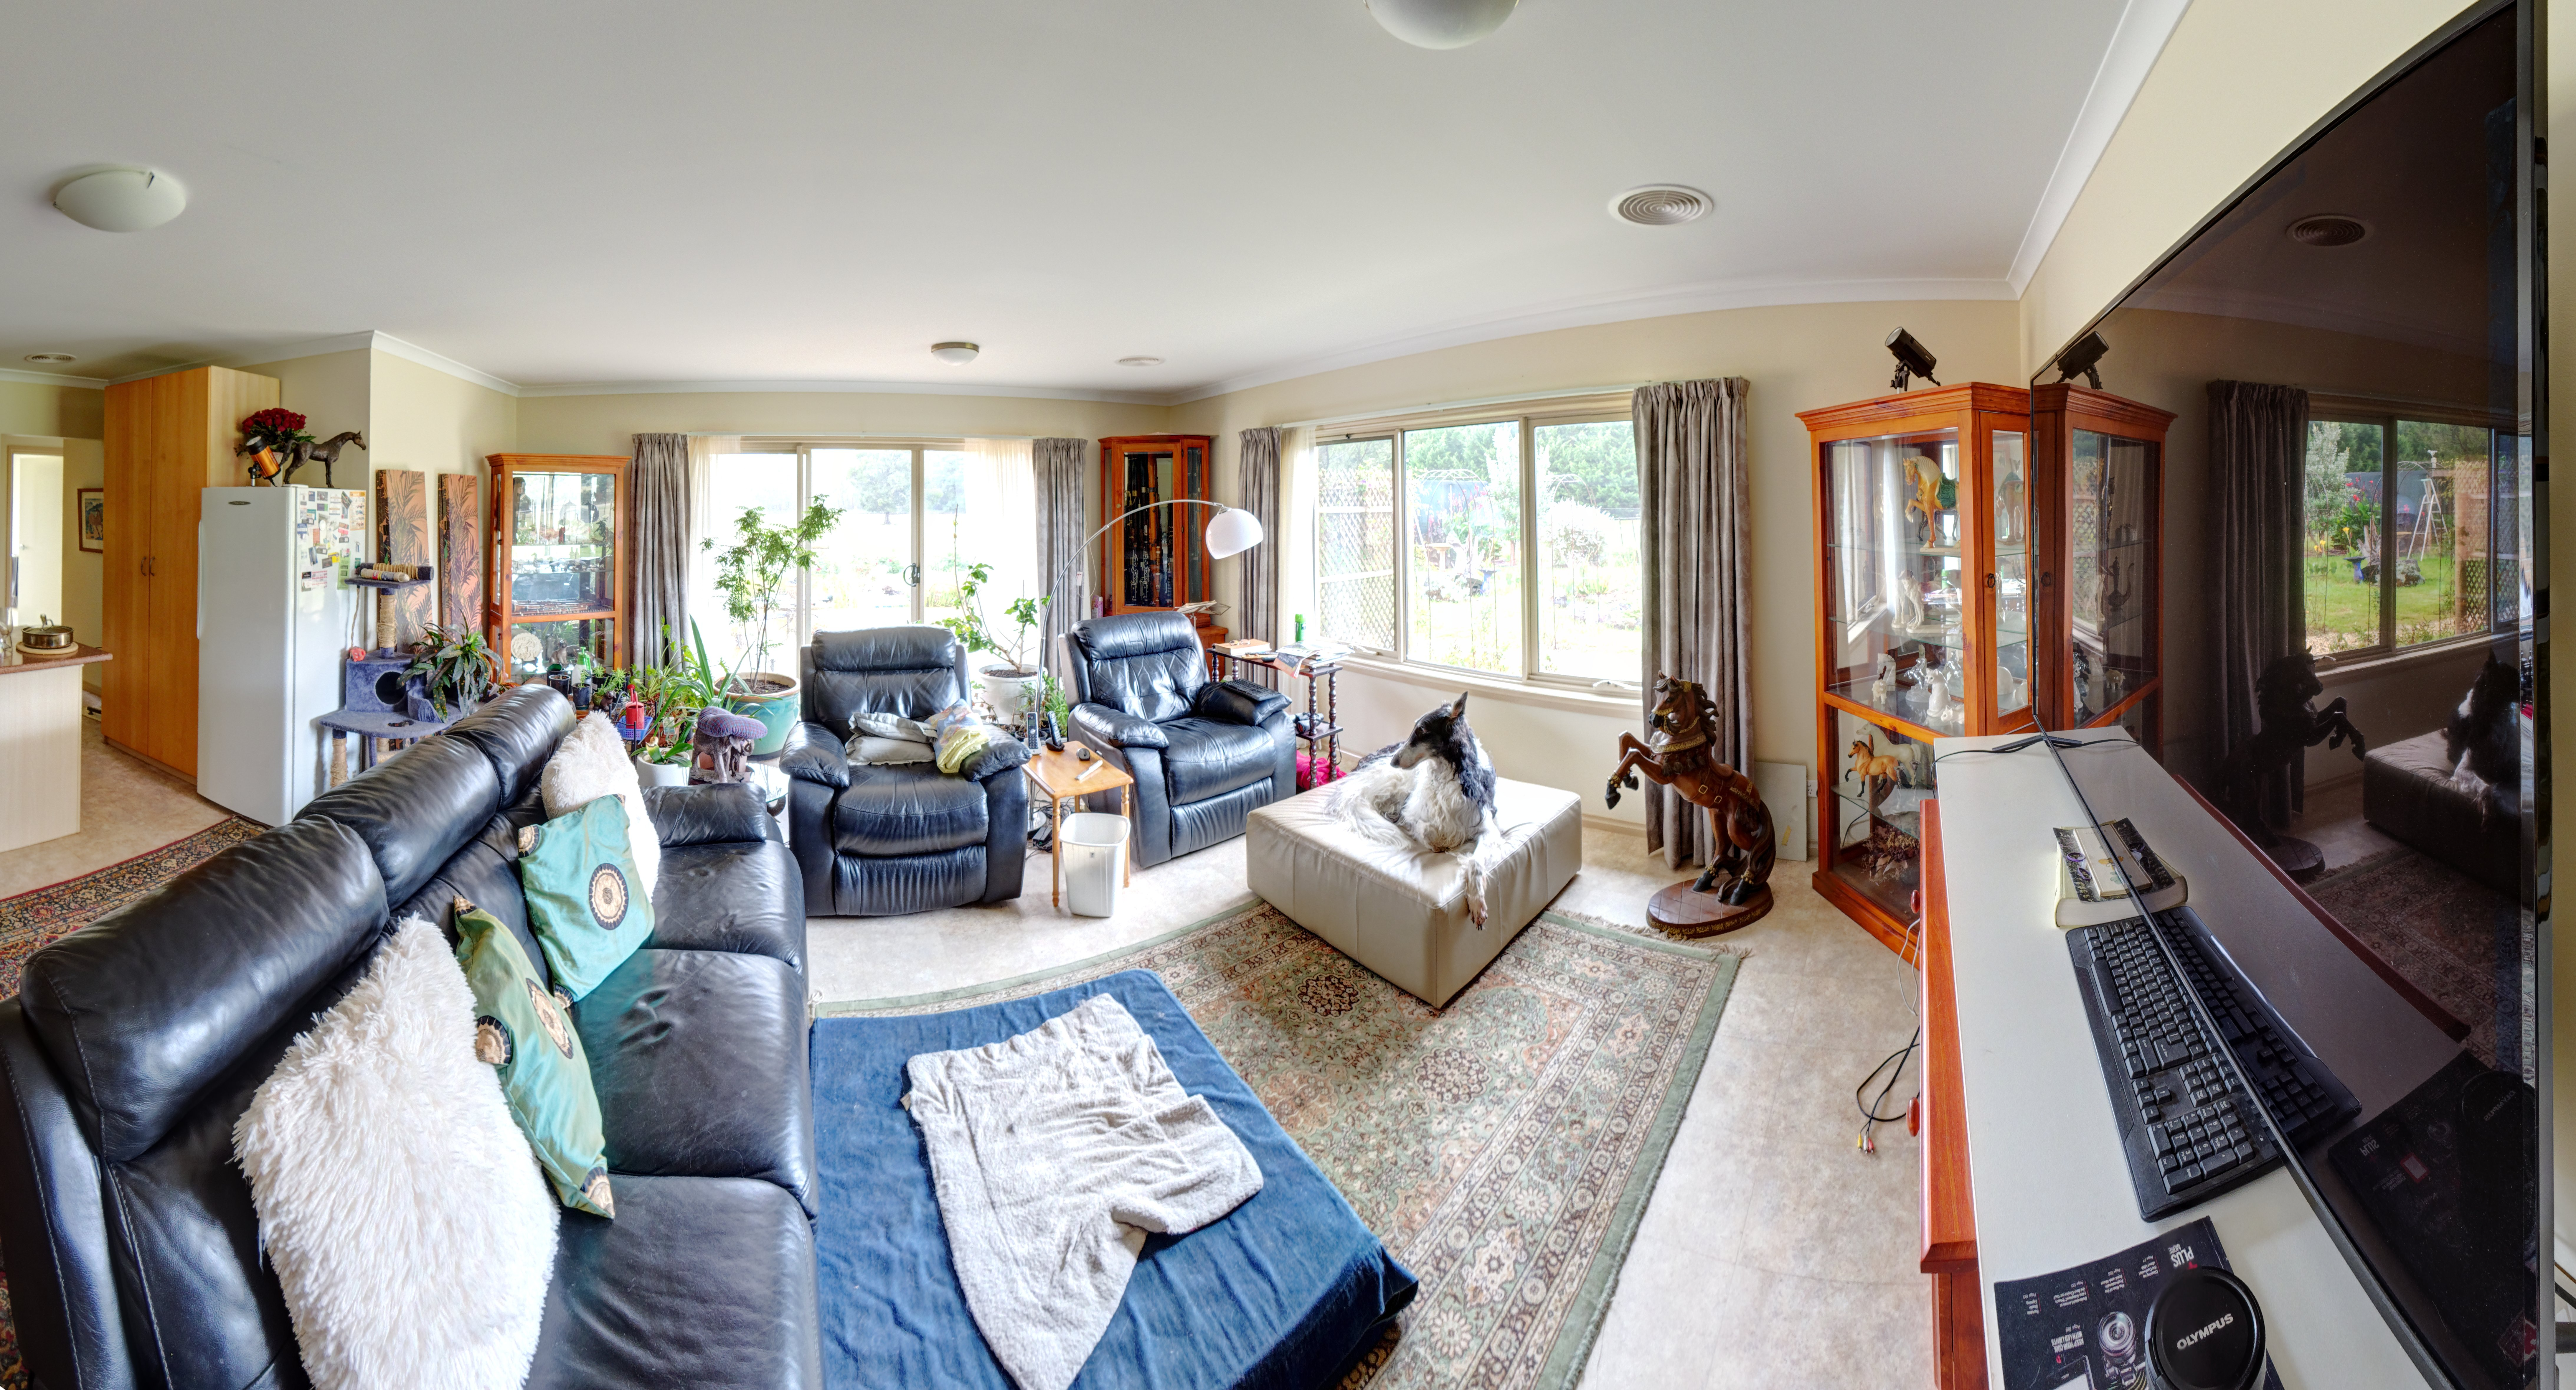 lounge-room-fisheye-cylindrical.jpeg